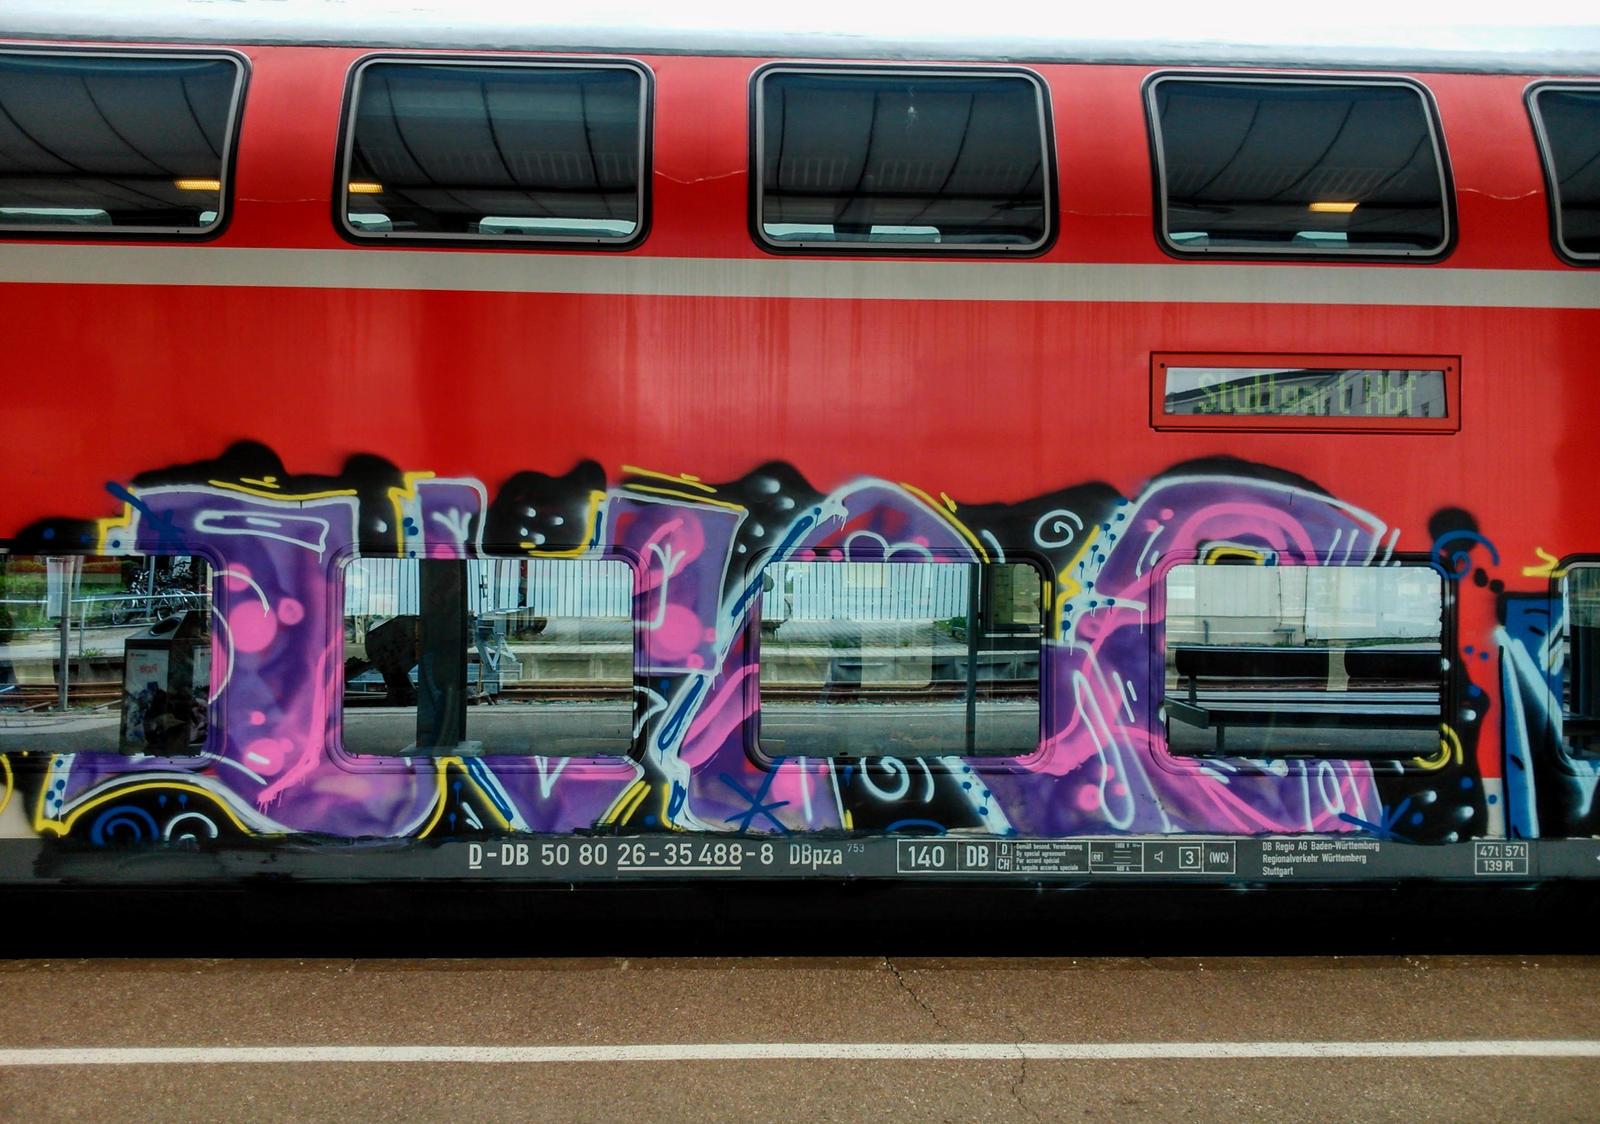 mobile graffito#2 by Mittelfranke